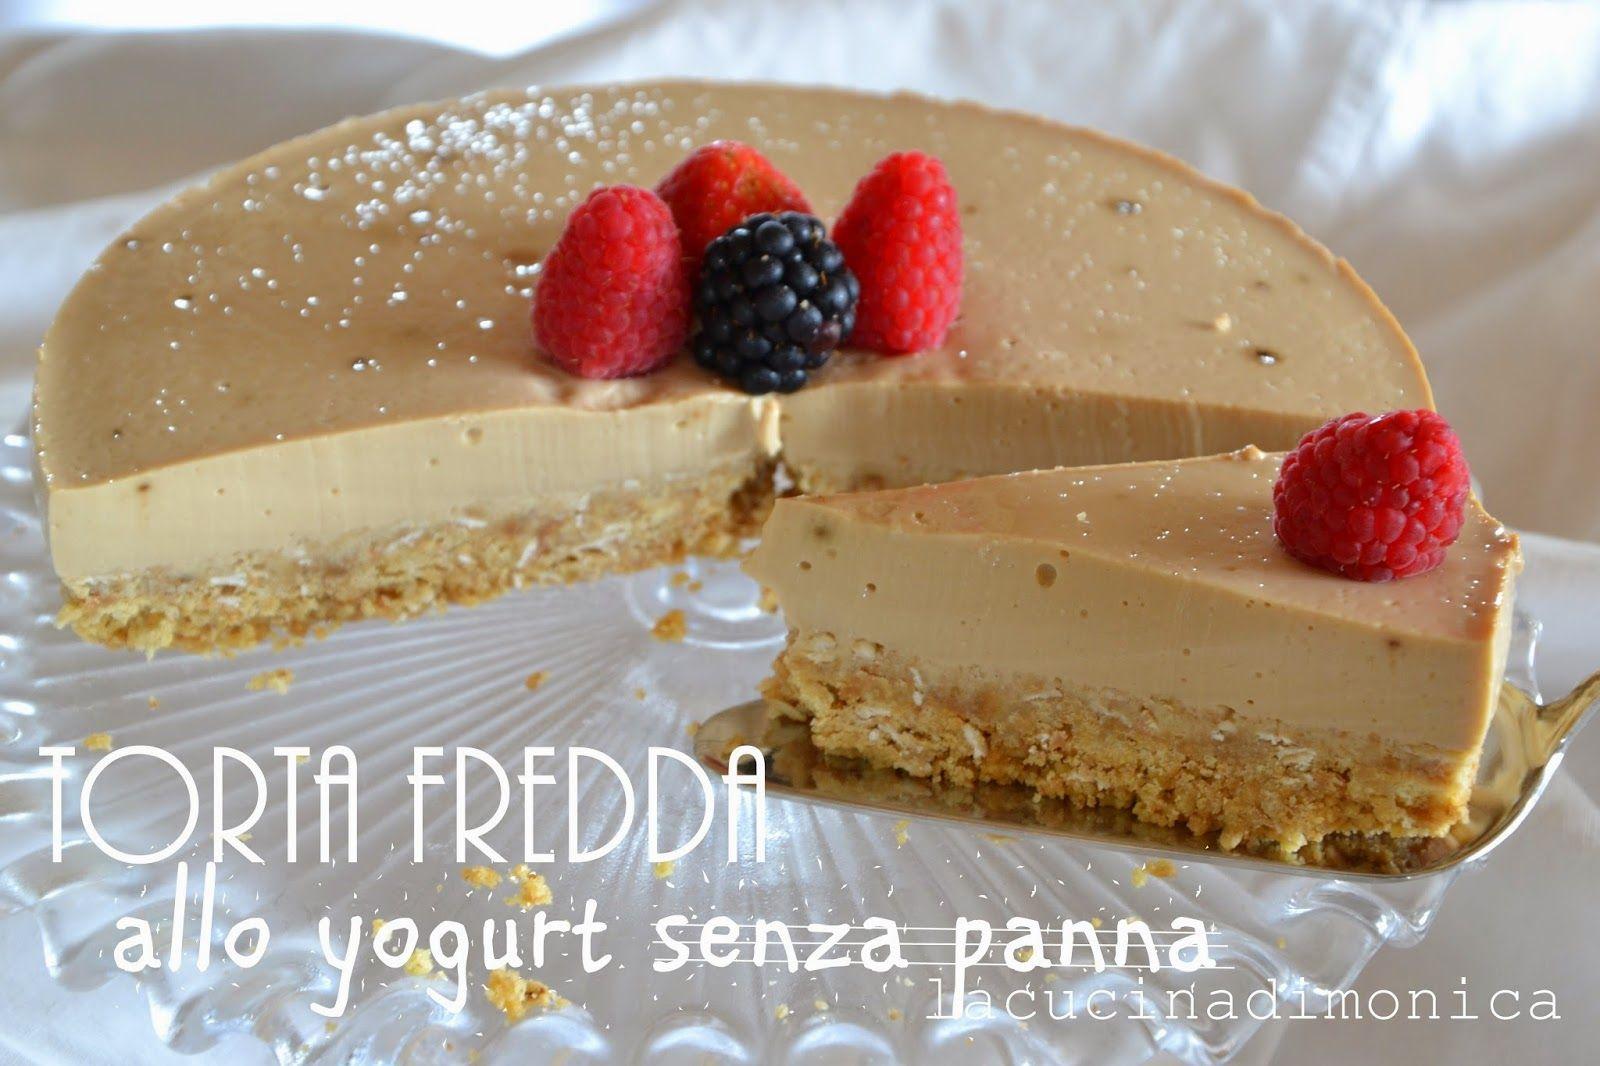 Torta fredda allo yogurt al caff senza panna la cucina di monica torte fredde pinterest - La cucina di monica ...